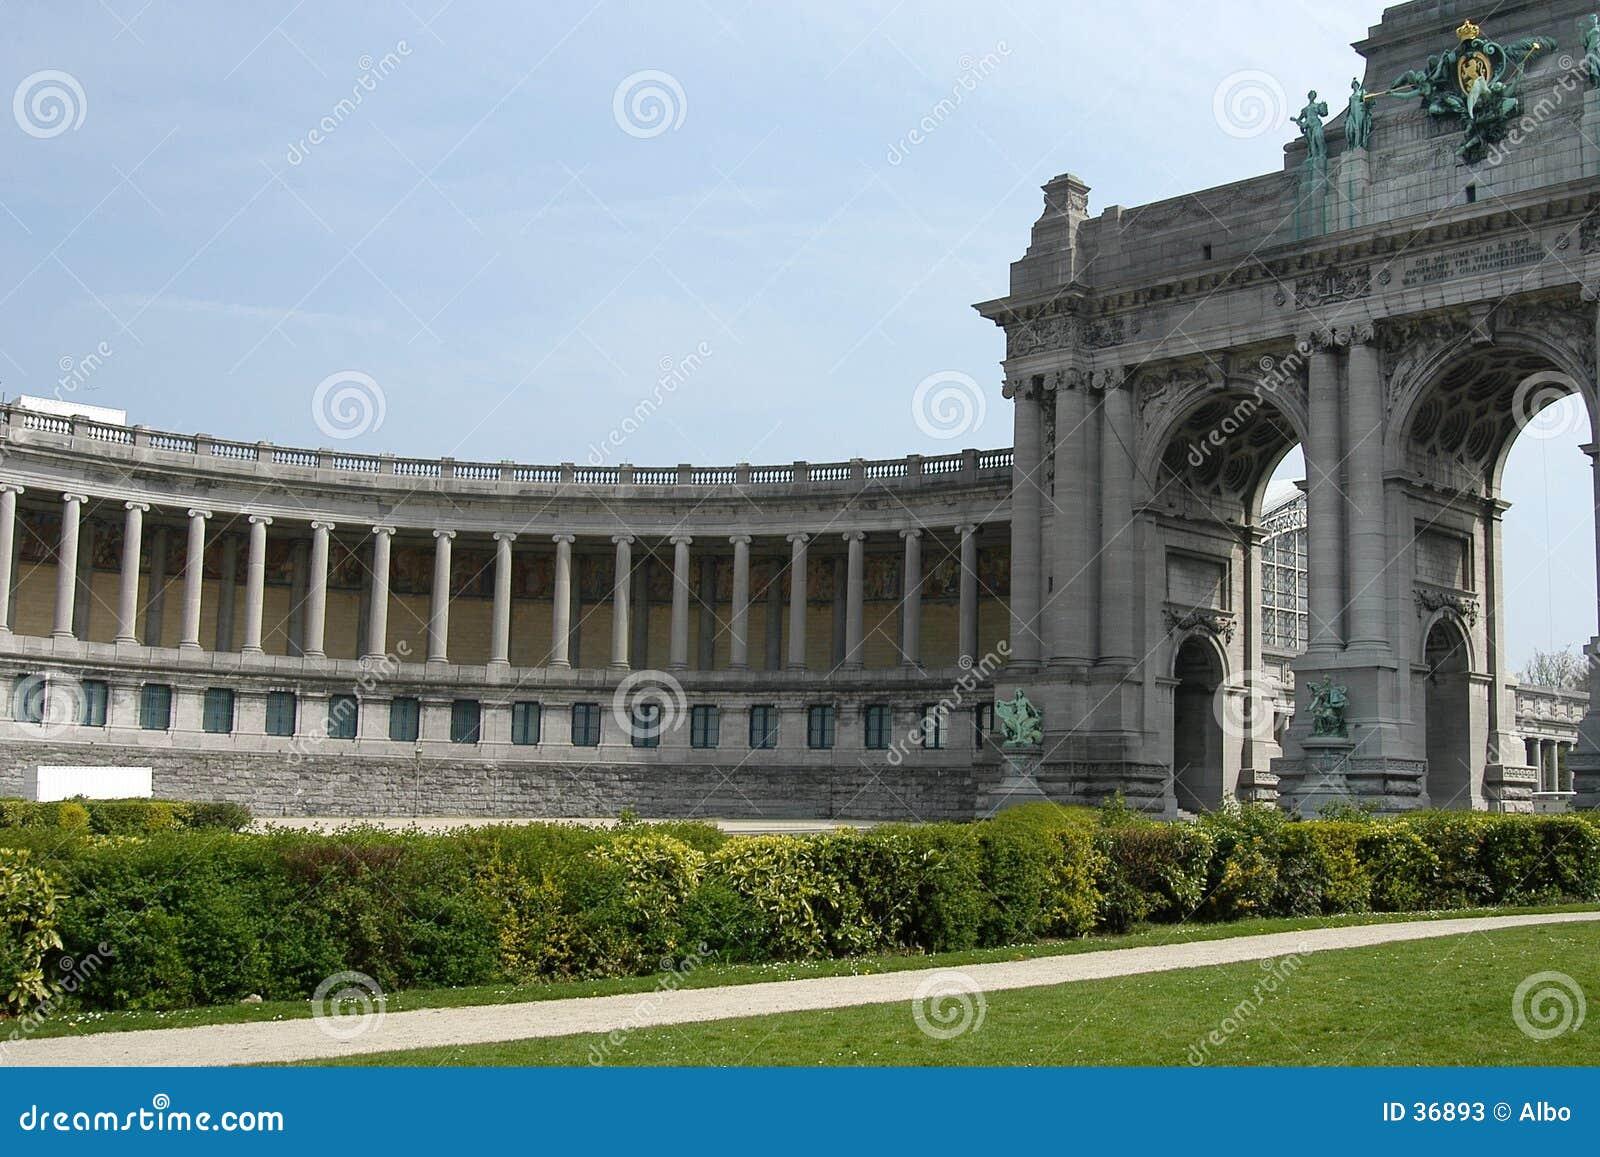 Download Bruselas: Parc Du Cinquantenaire Imagen de archivo - Imagen de historia, histórico: 36893